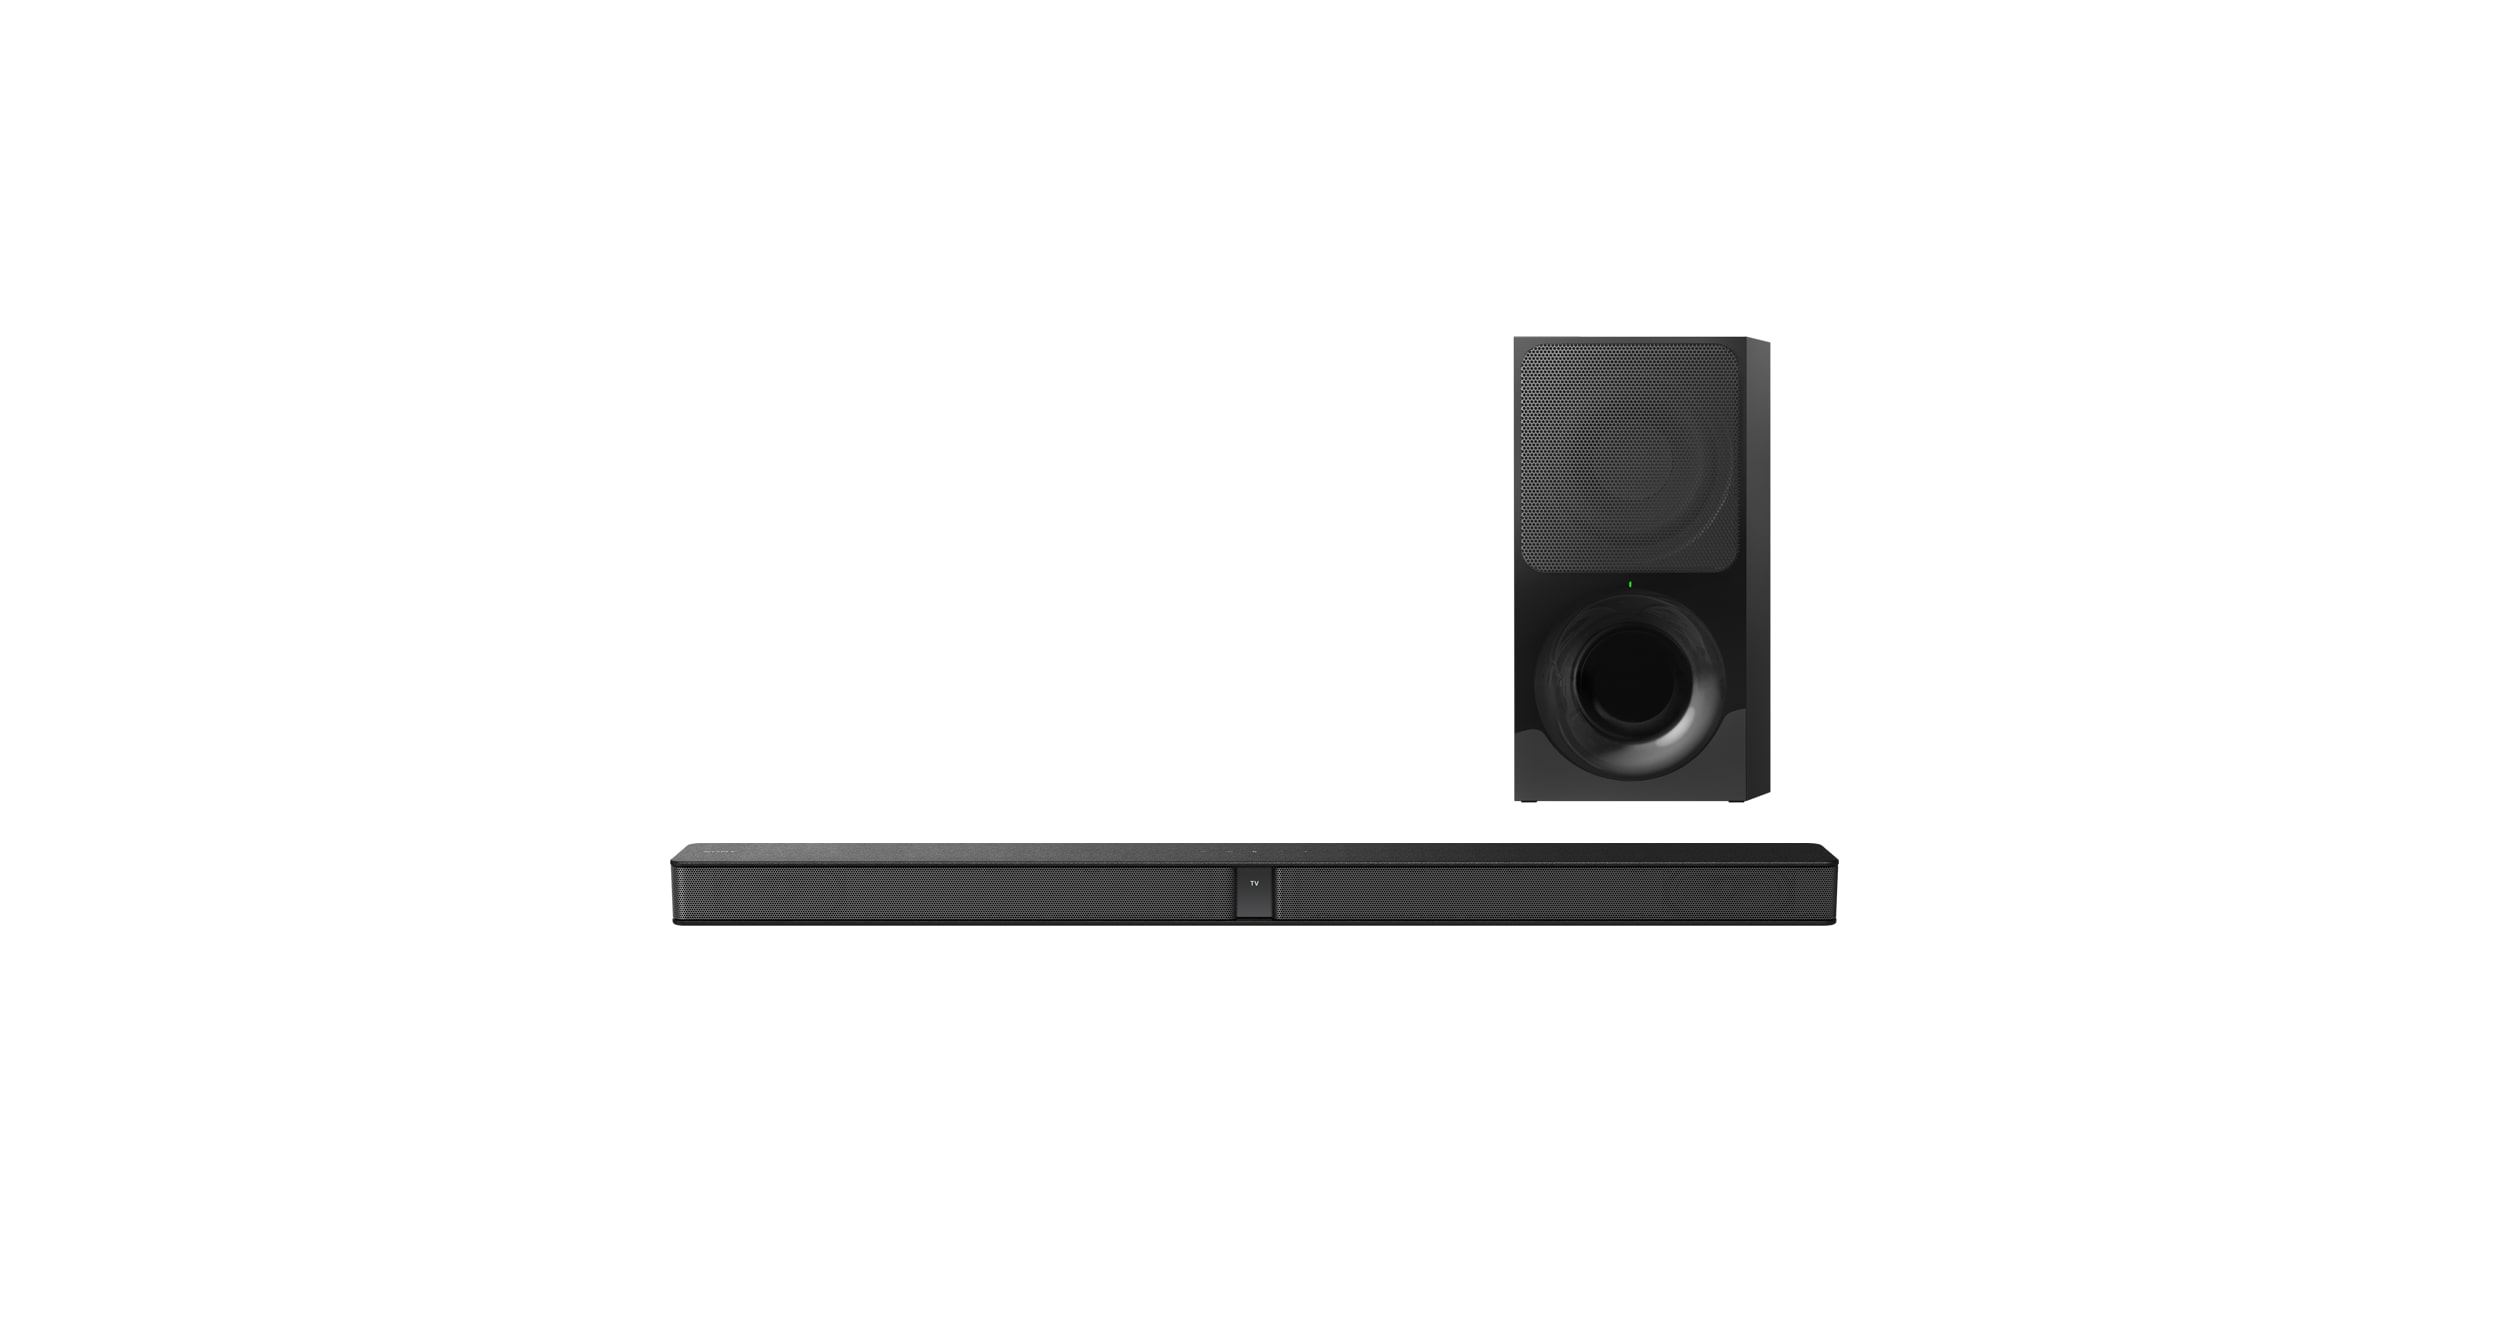 HT-CT290 | 2.1ch Soundbar with Bluetooth® | Sony US